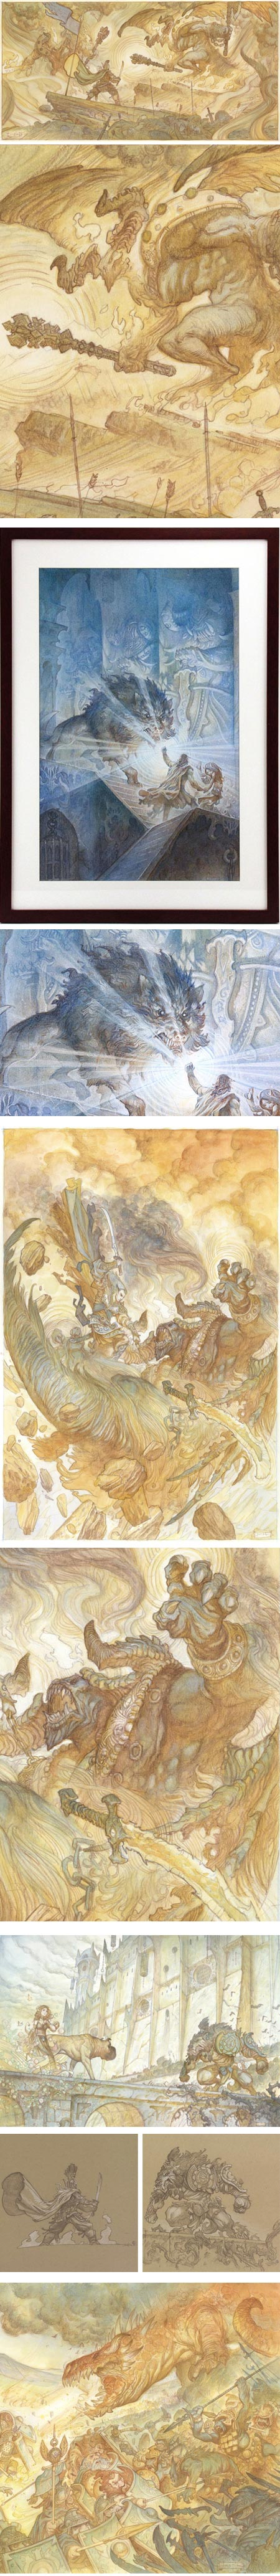 Justin Gerard's Silmarillion ast Gallery Nucleus